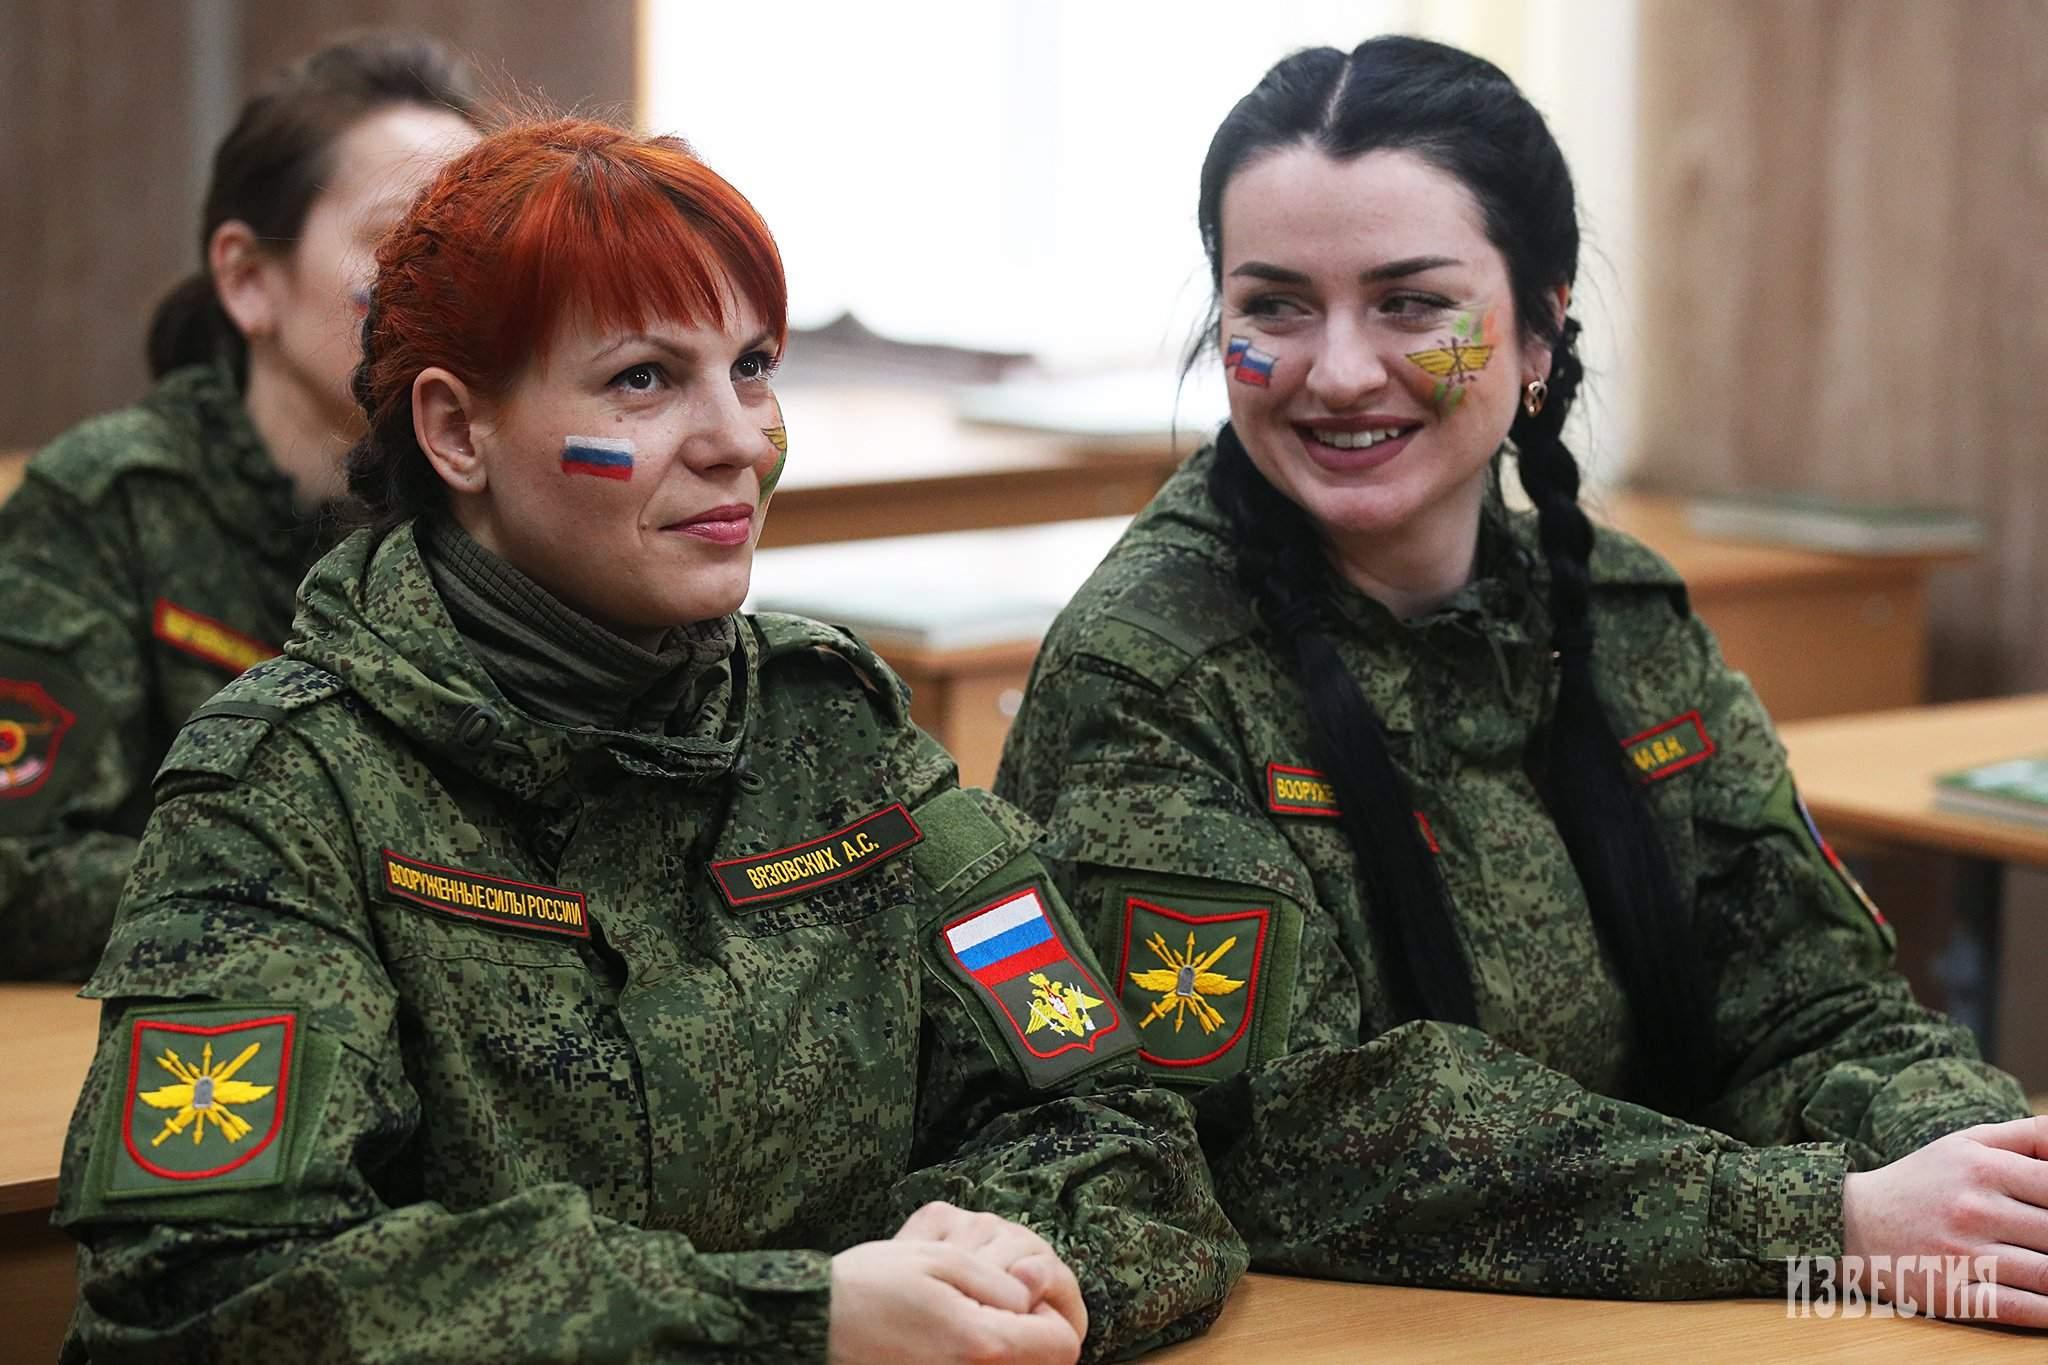 https://cdn.iz.ru/sites/default/files/styles/2048x1365/public/photo_item-2020-03/1583336543_3.JPG